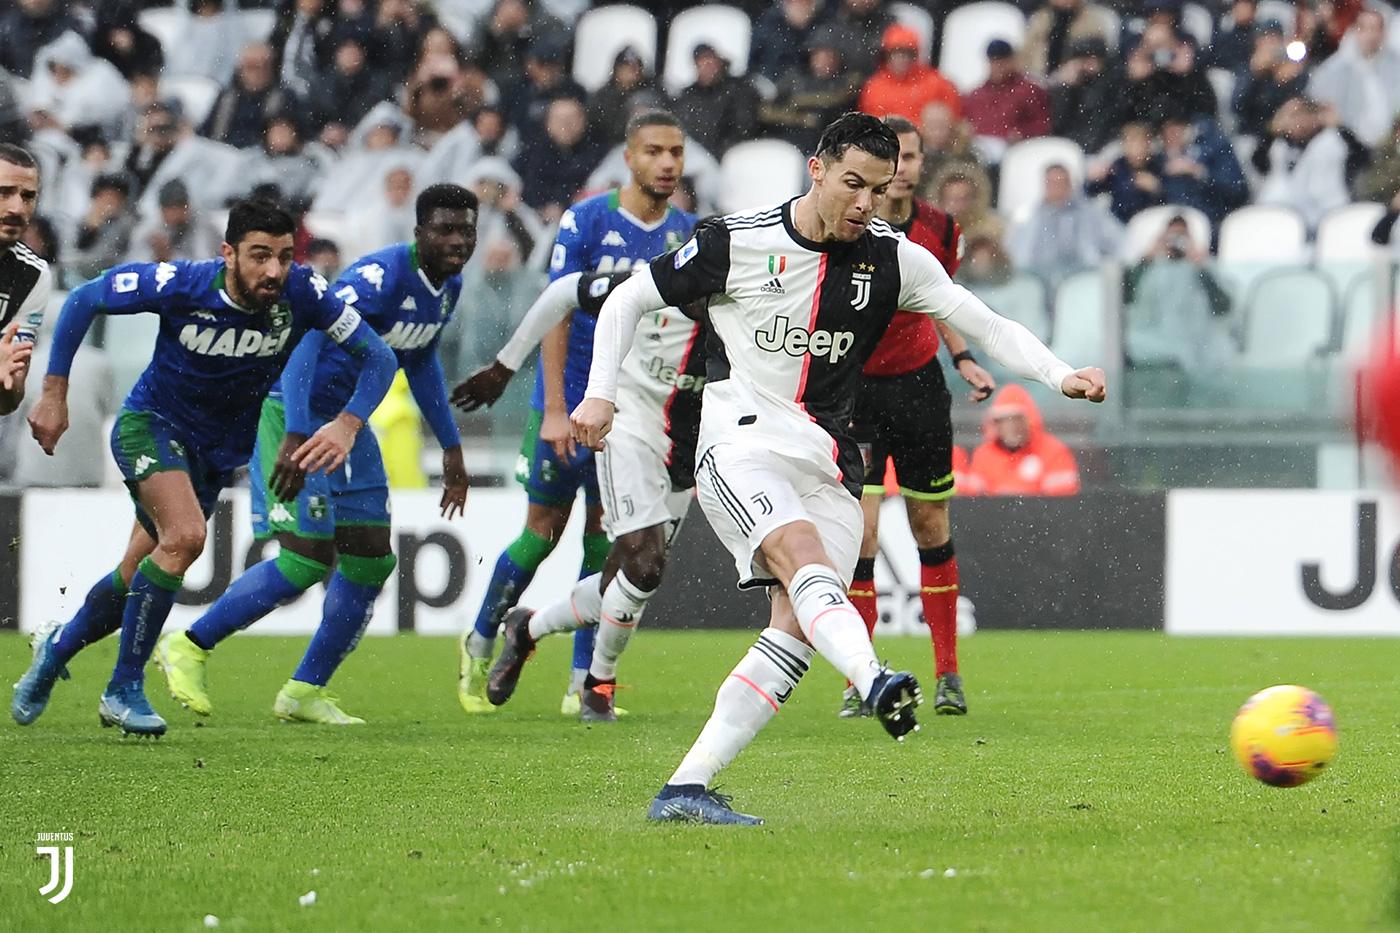 Juventus-Sassuolo 2-2, persa la testa